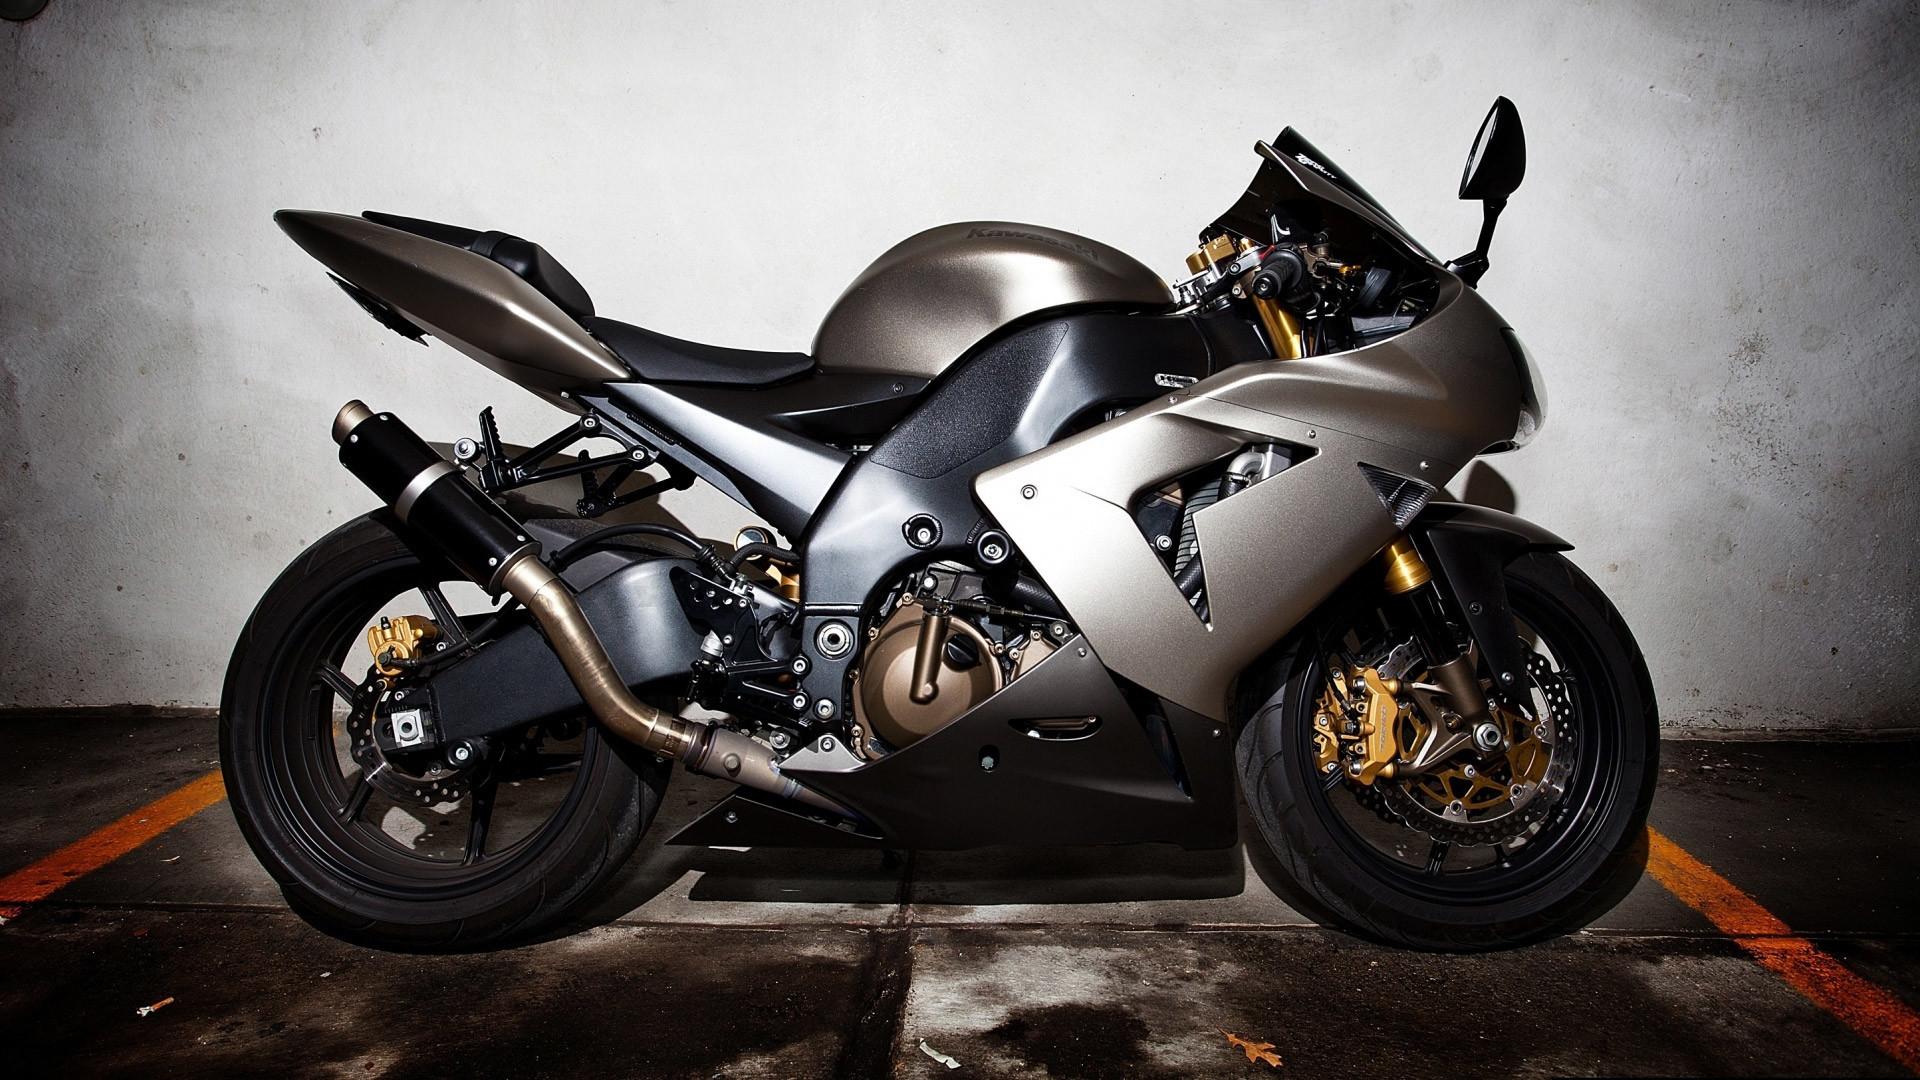 motorbike wallpaper (62+ pictures)